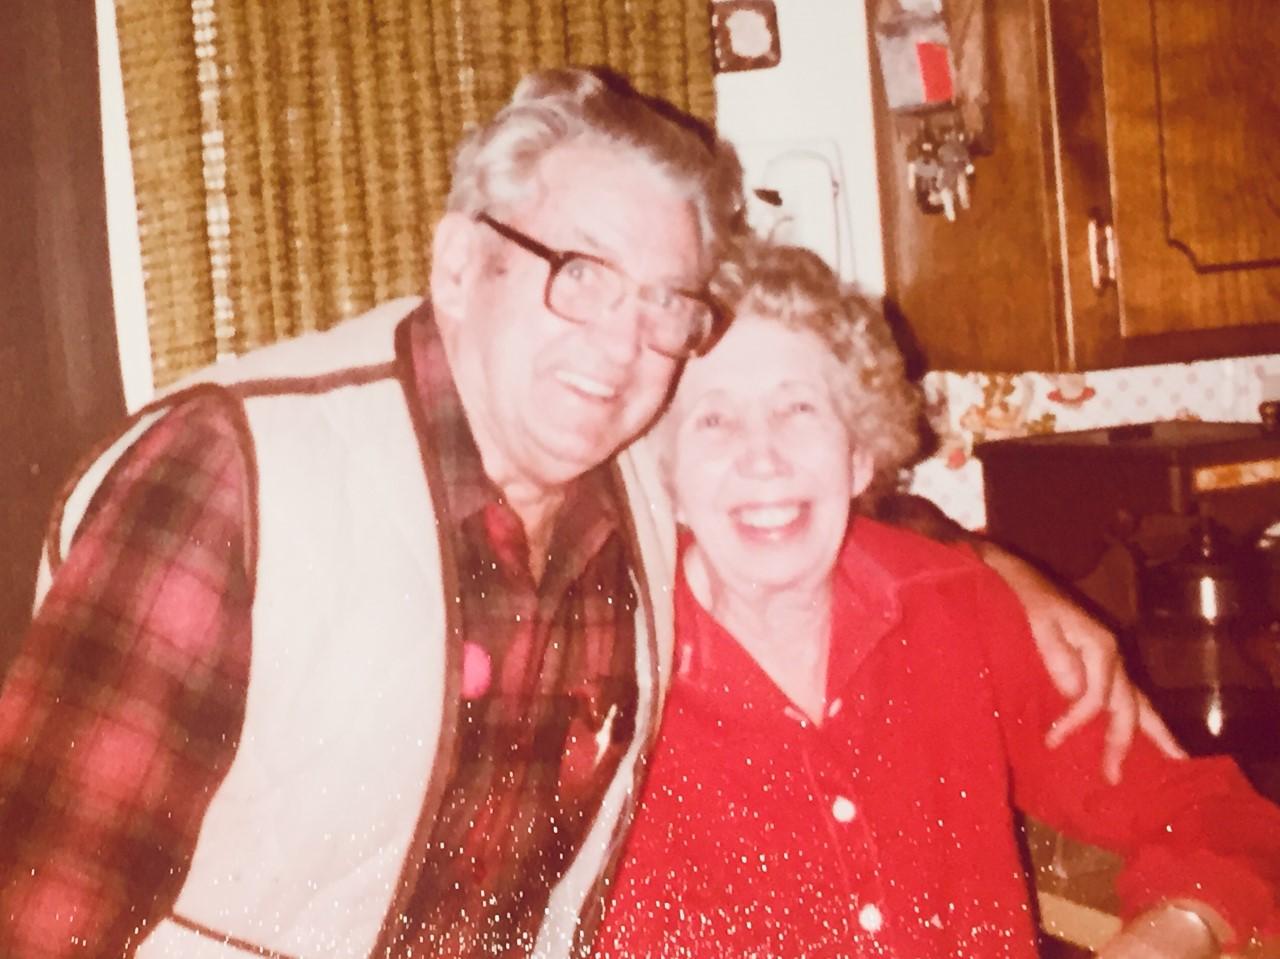 Geyer's parents in 1968. Photo courtesy of Al Geyer